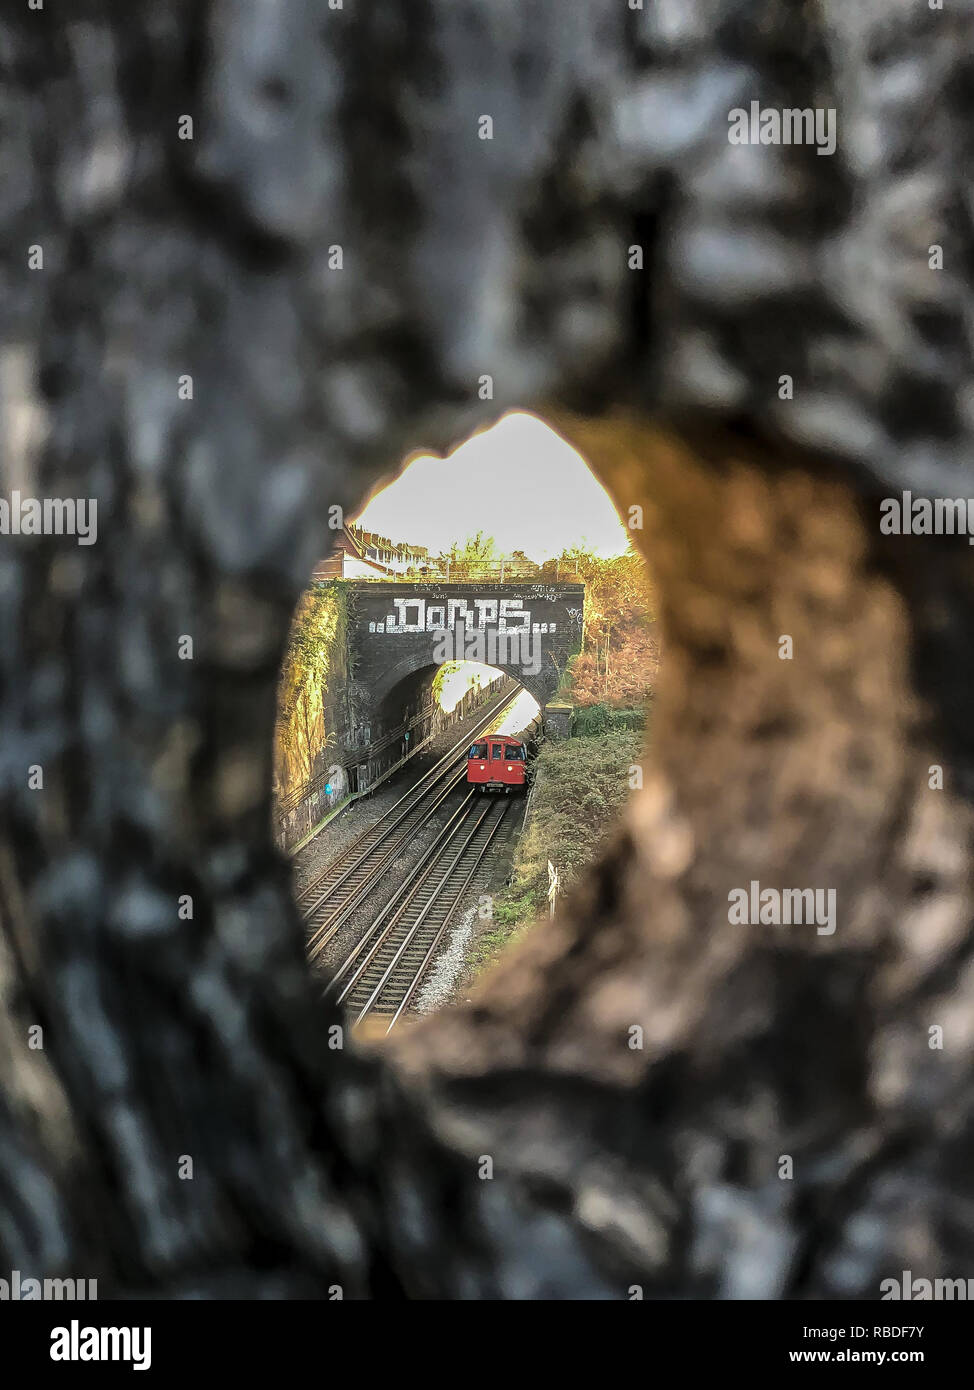 Eye Spy -  A London Underground tock train on the Bakerloo Line northbound at Harlesden. - Stock Image